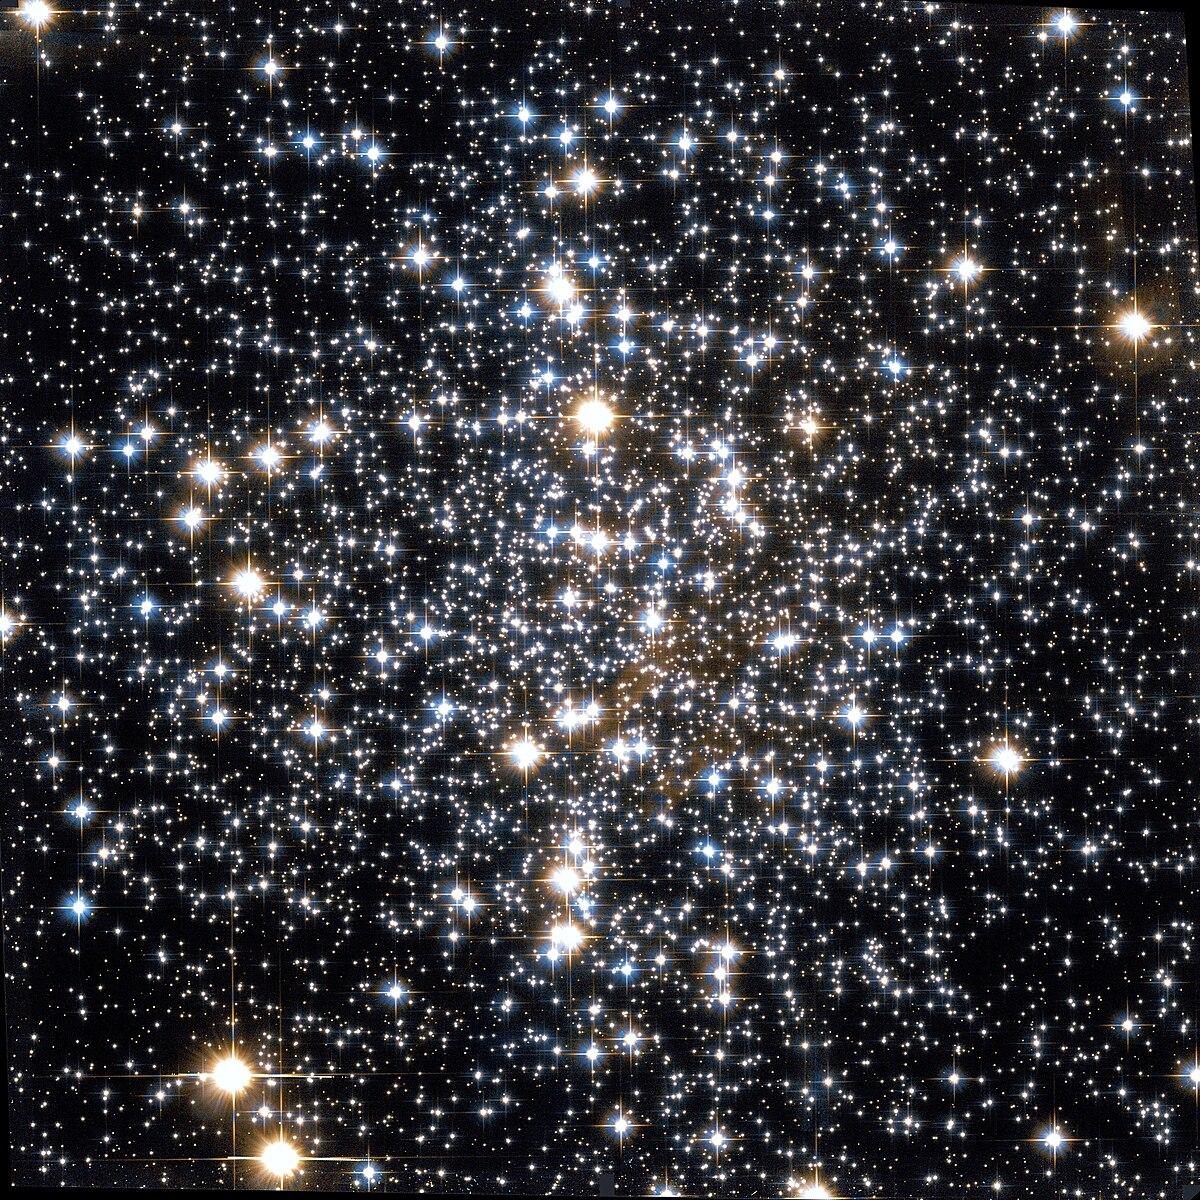 Messier 4 - Wikipedia